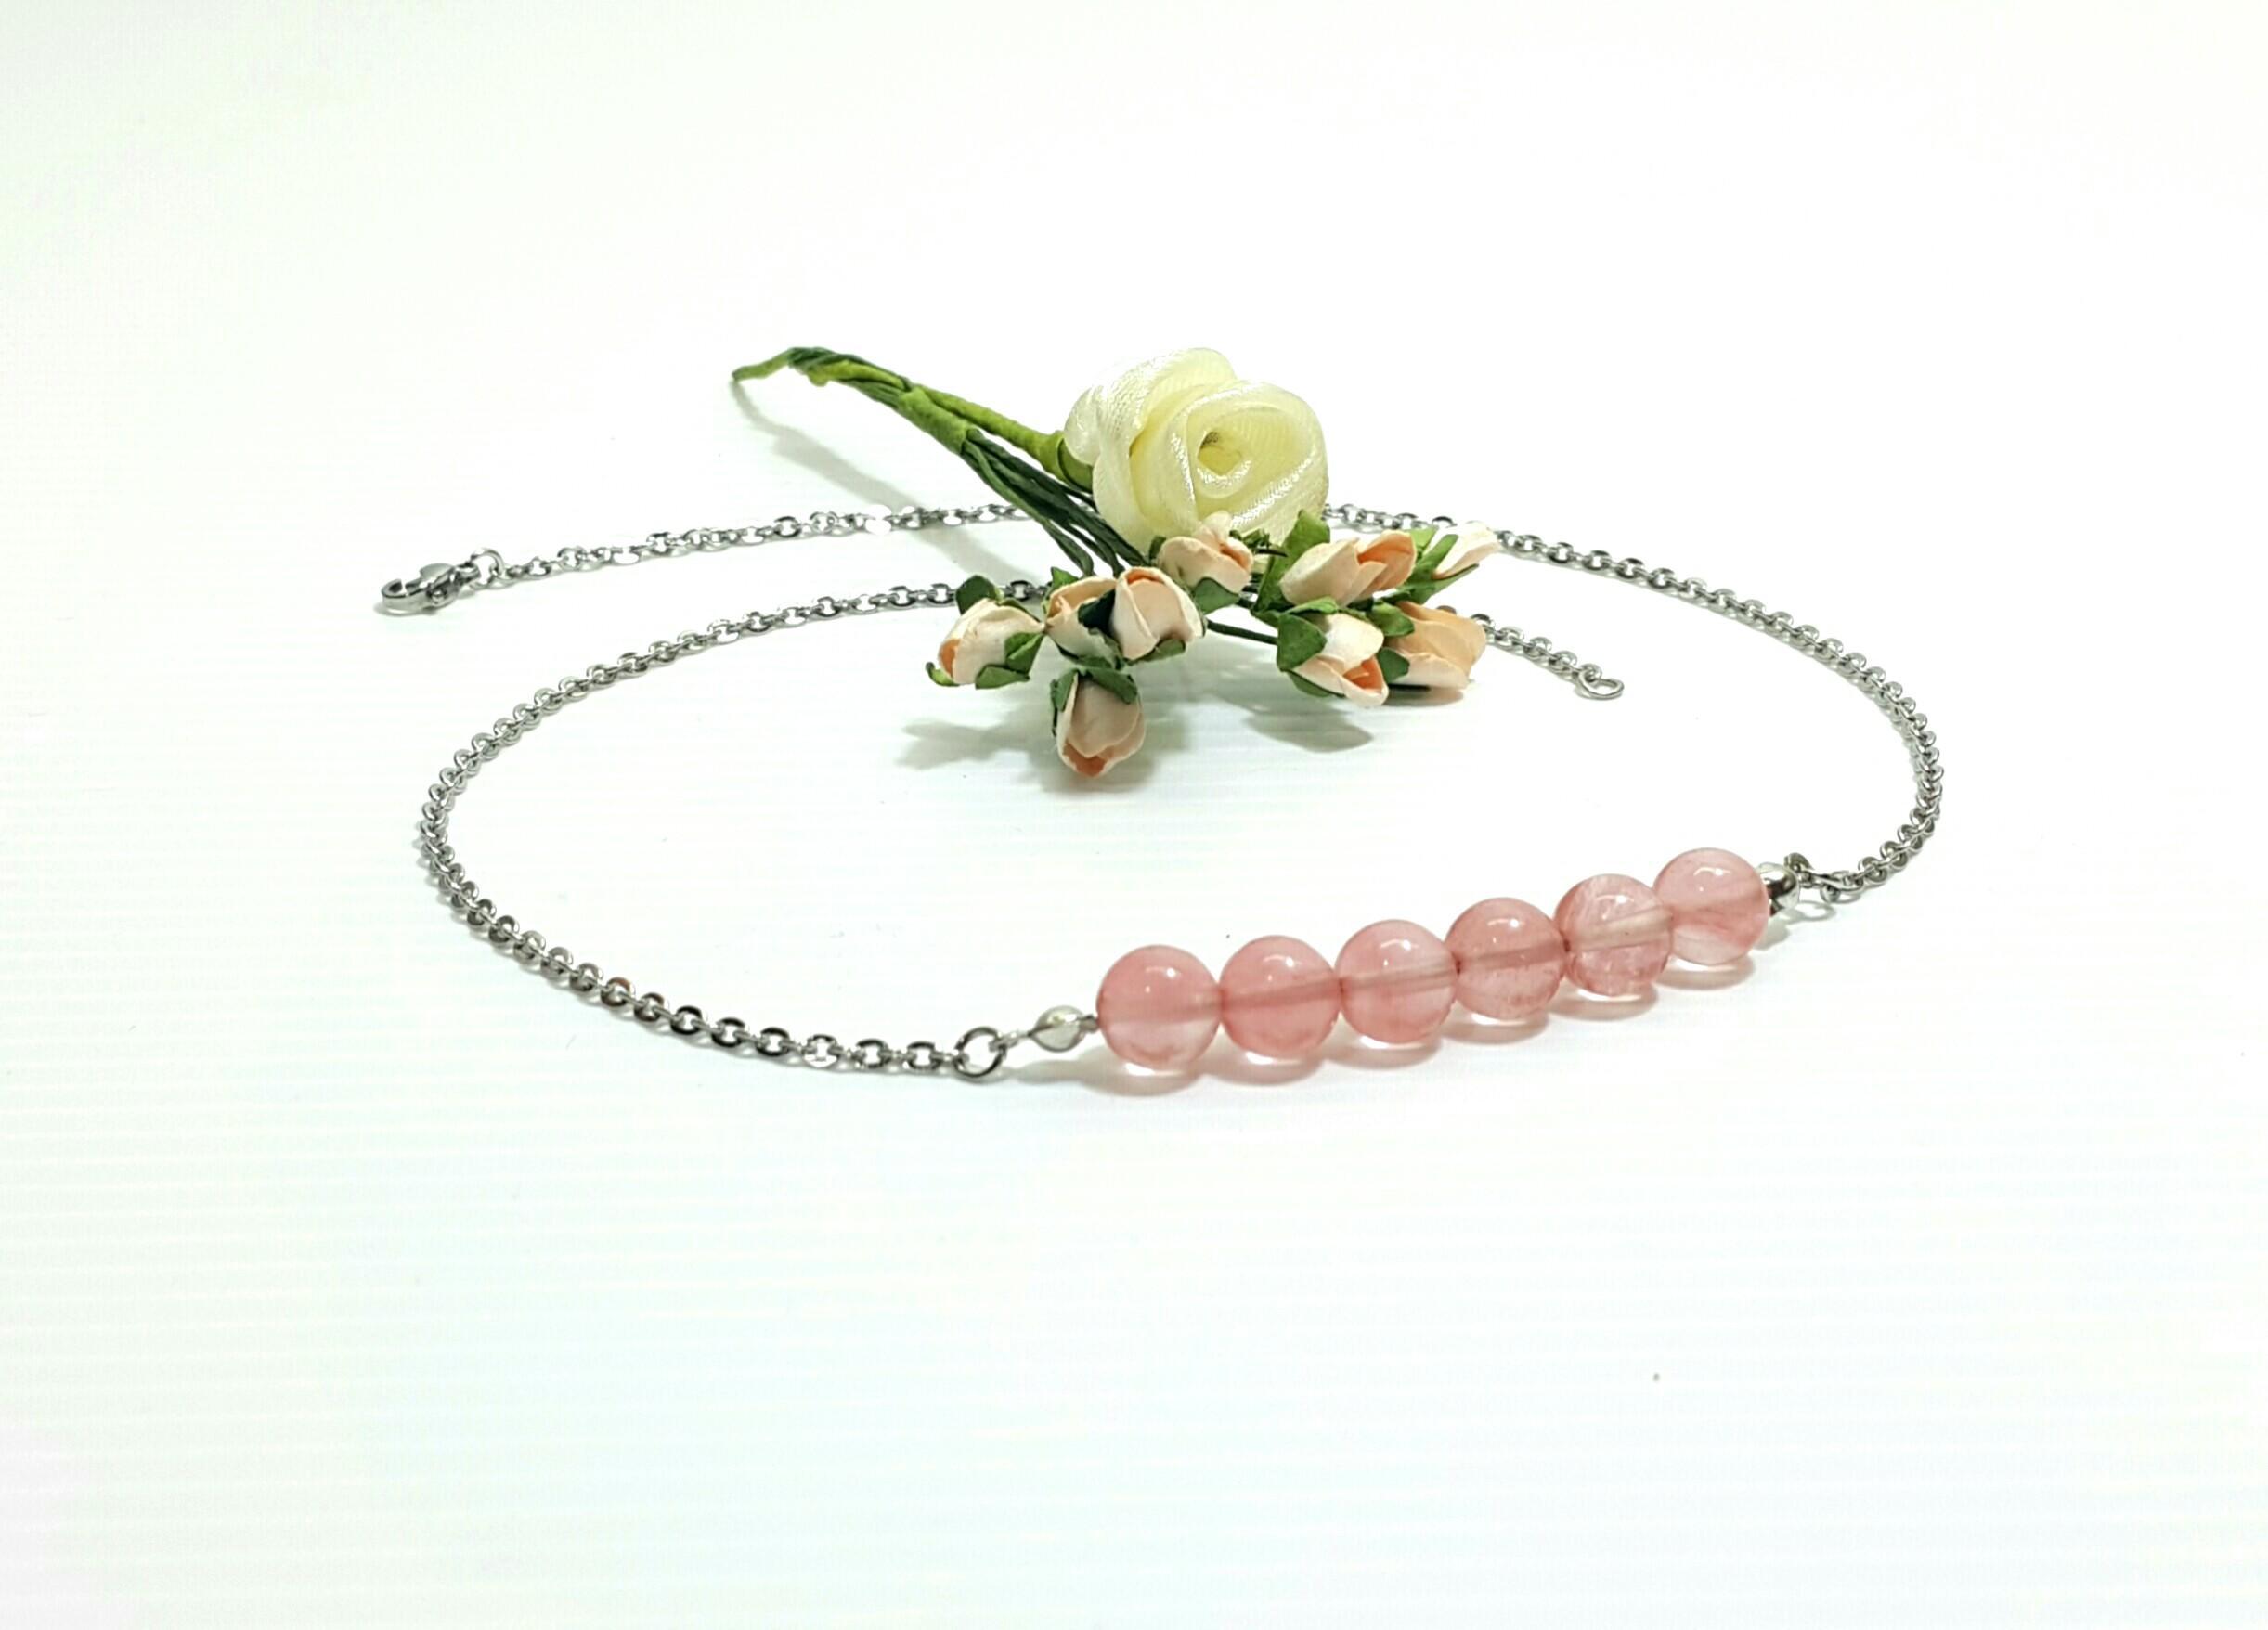 Cherry Quartz Beads Necklace for Women/Men